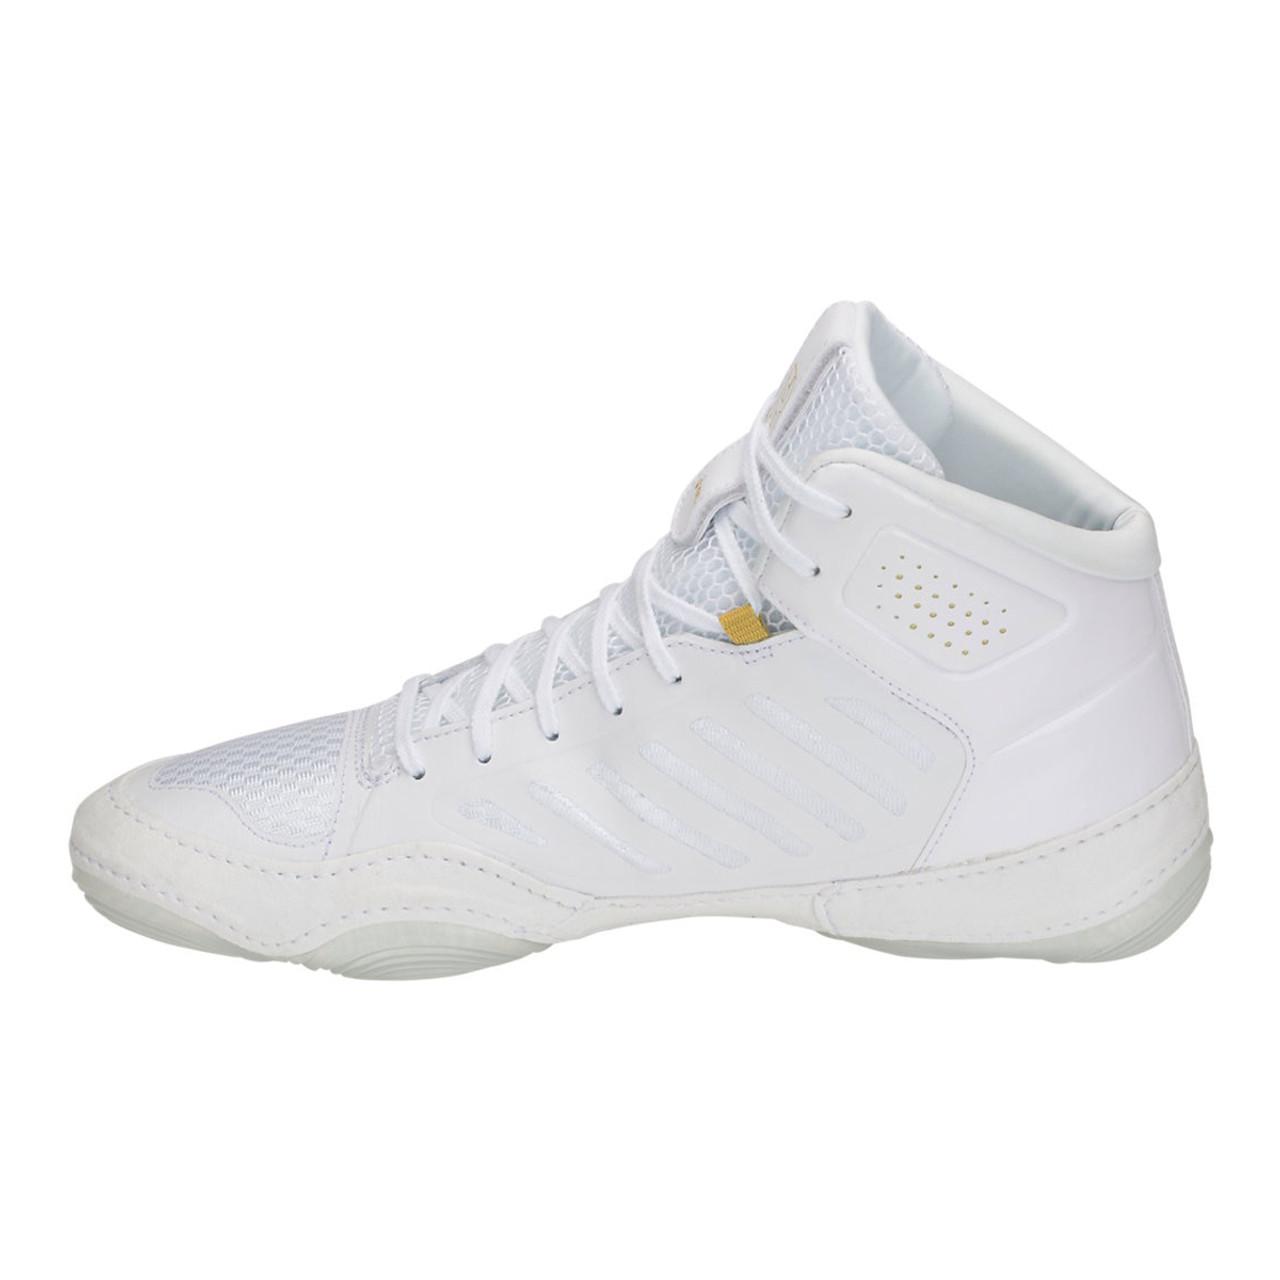 449785bec7802f ... Wrestling Shoes · Asics JB Elite III Men s Wrestling ...